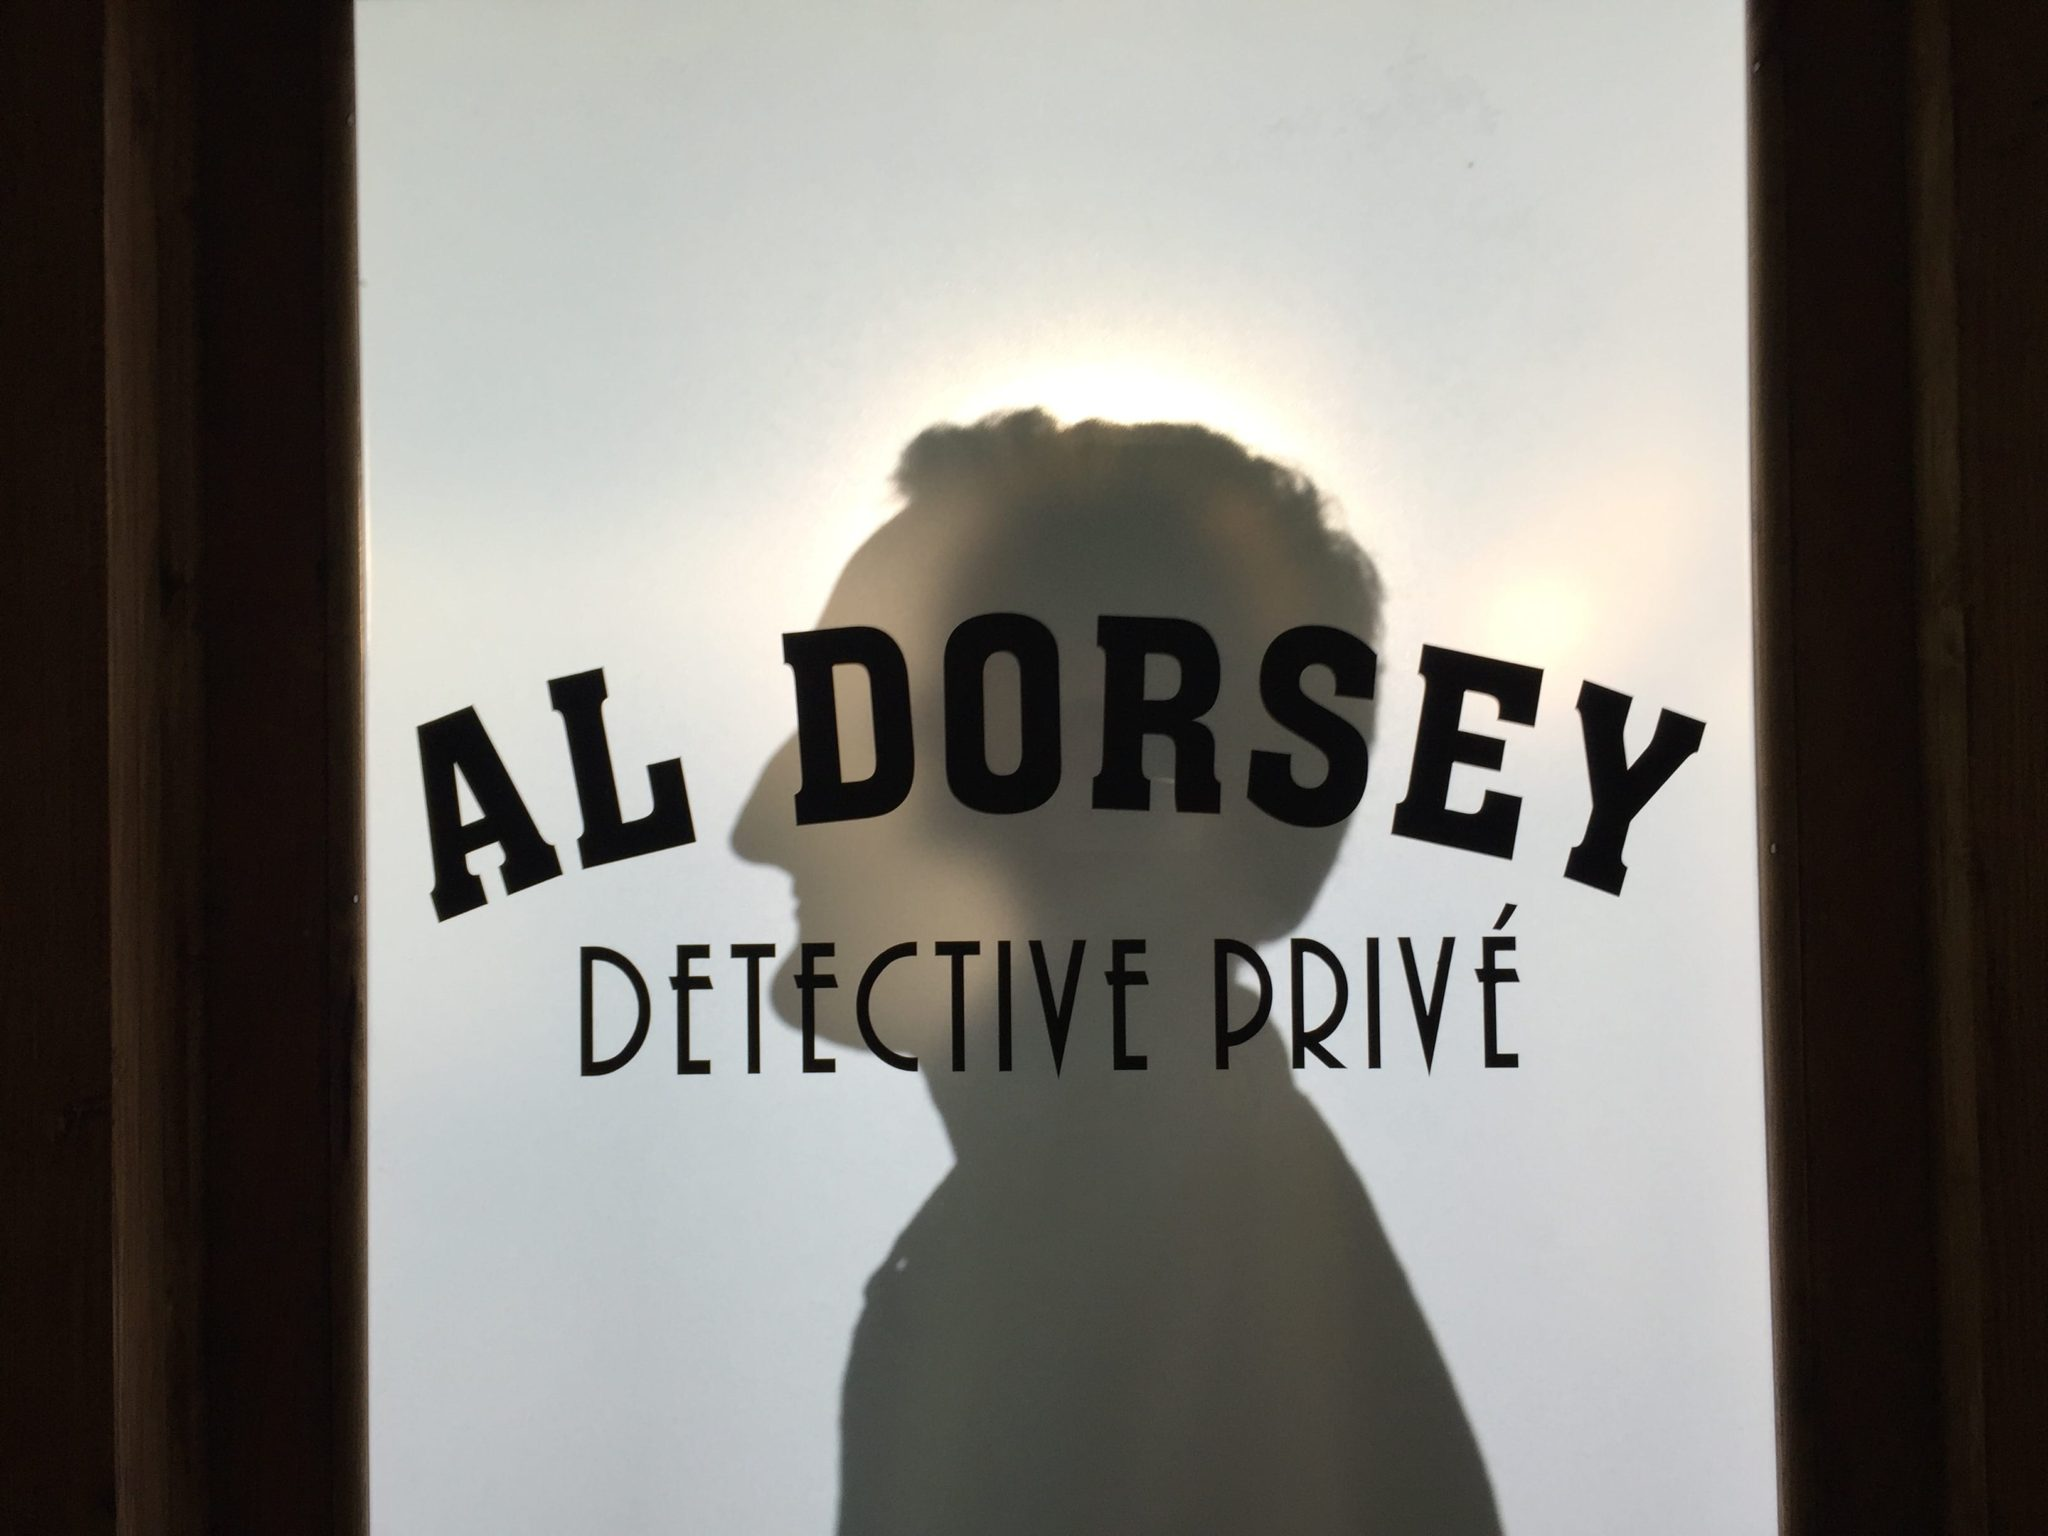 AL DORSEY, DETECTIVE PRIVE S01